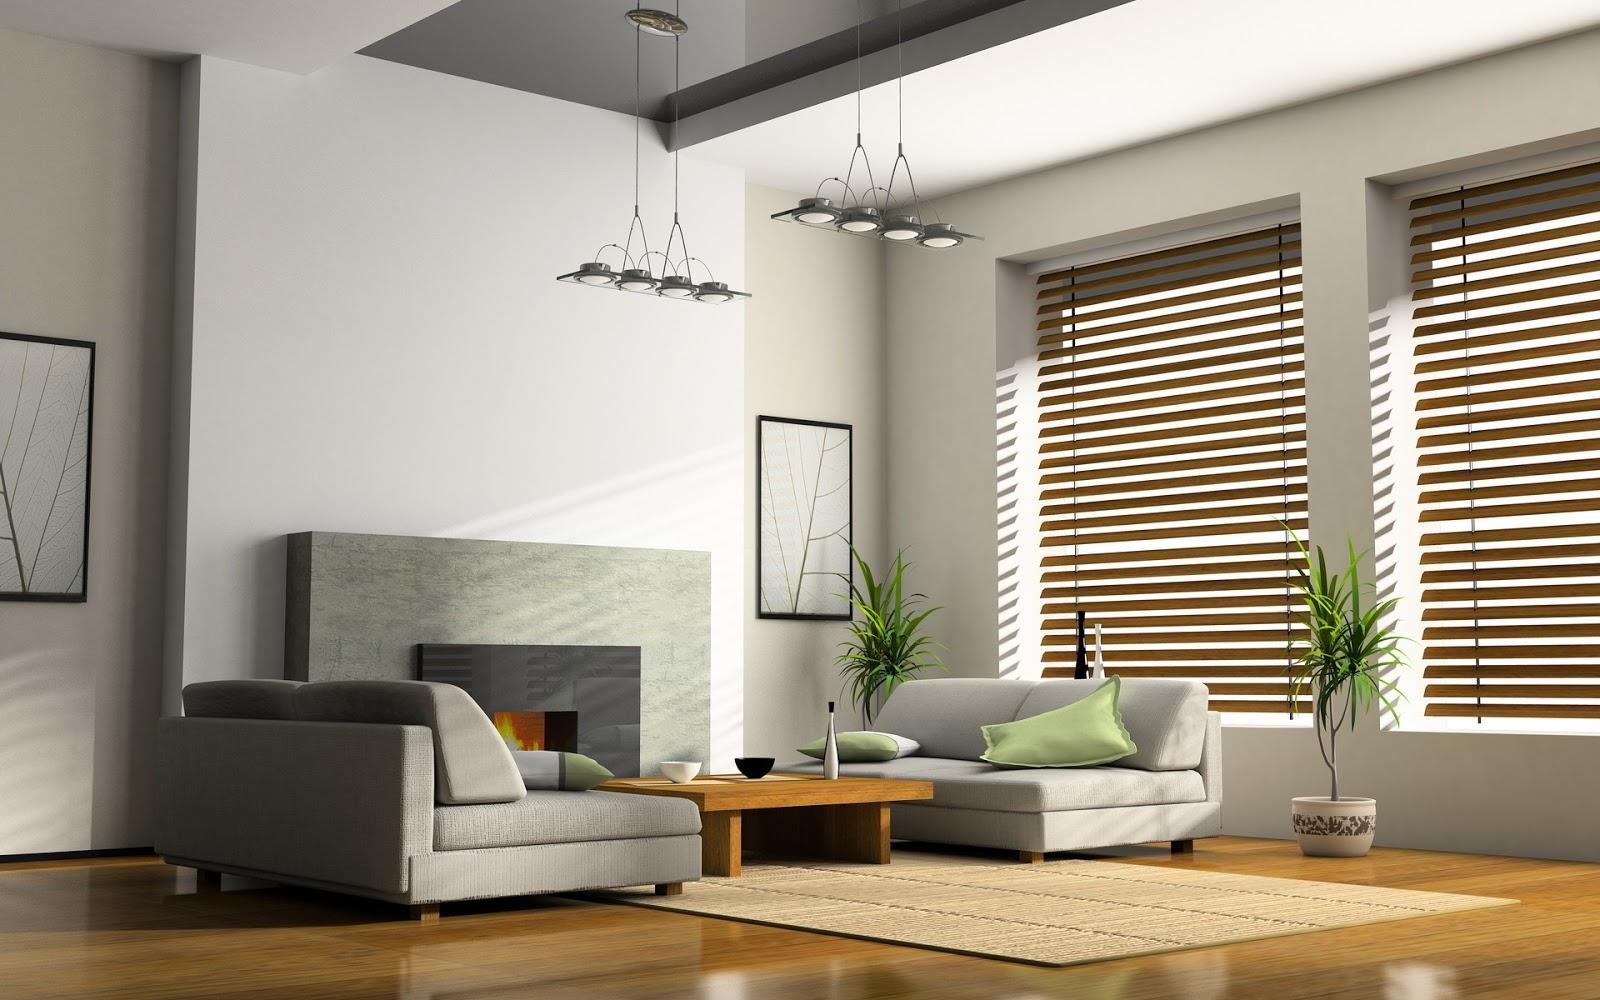 Interior design hd wallpapers - Modern house interior design ...